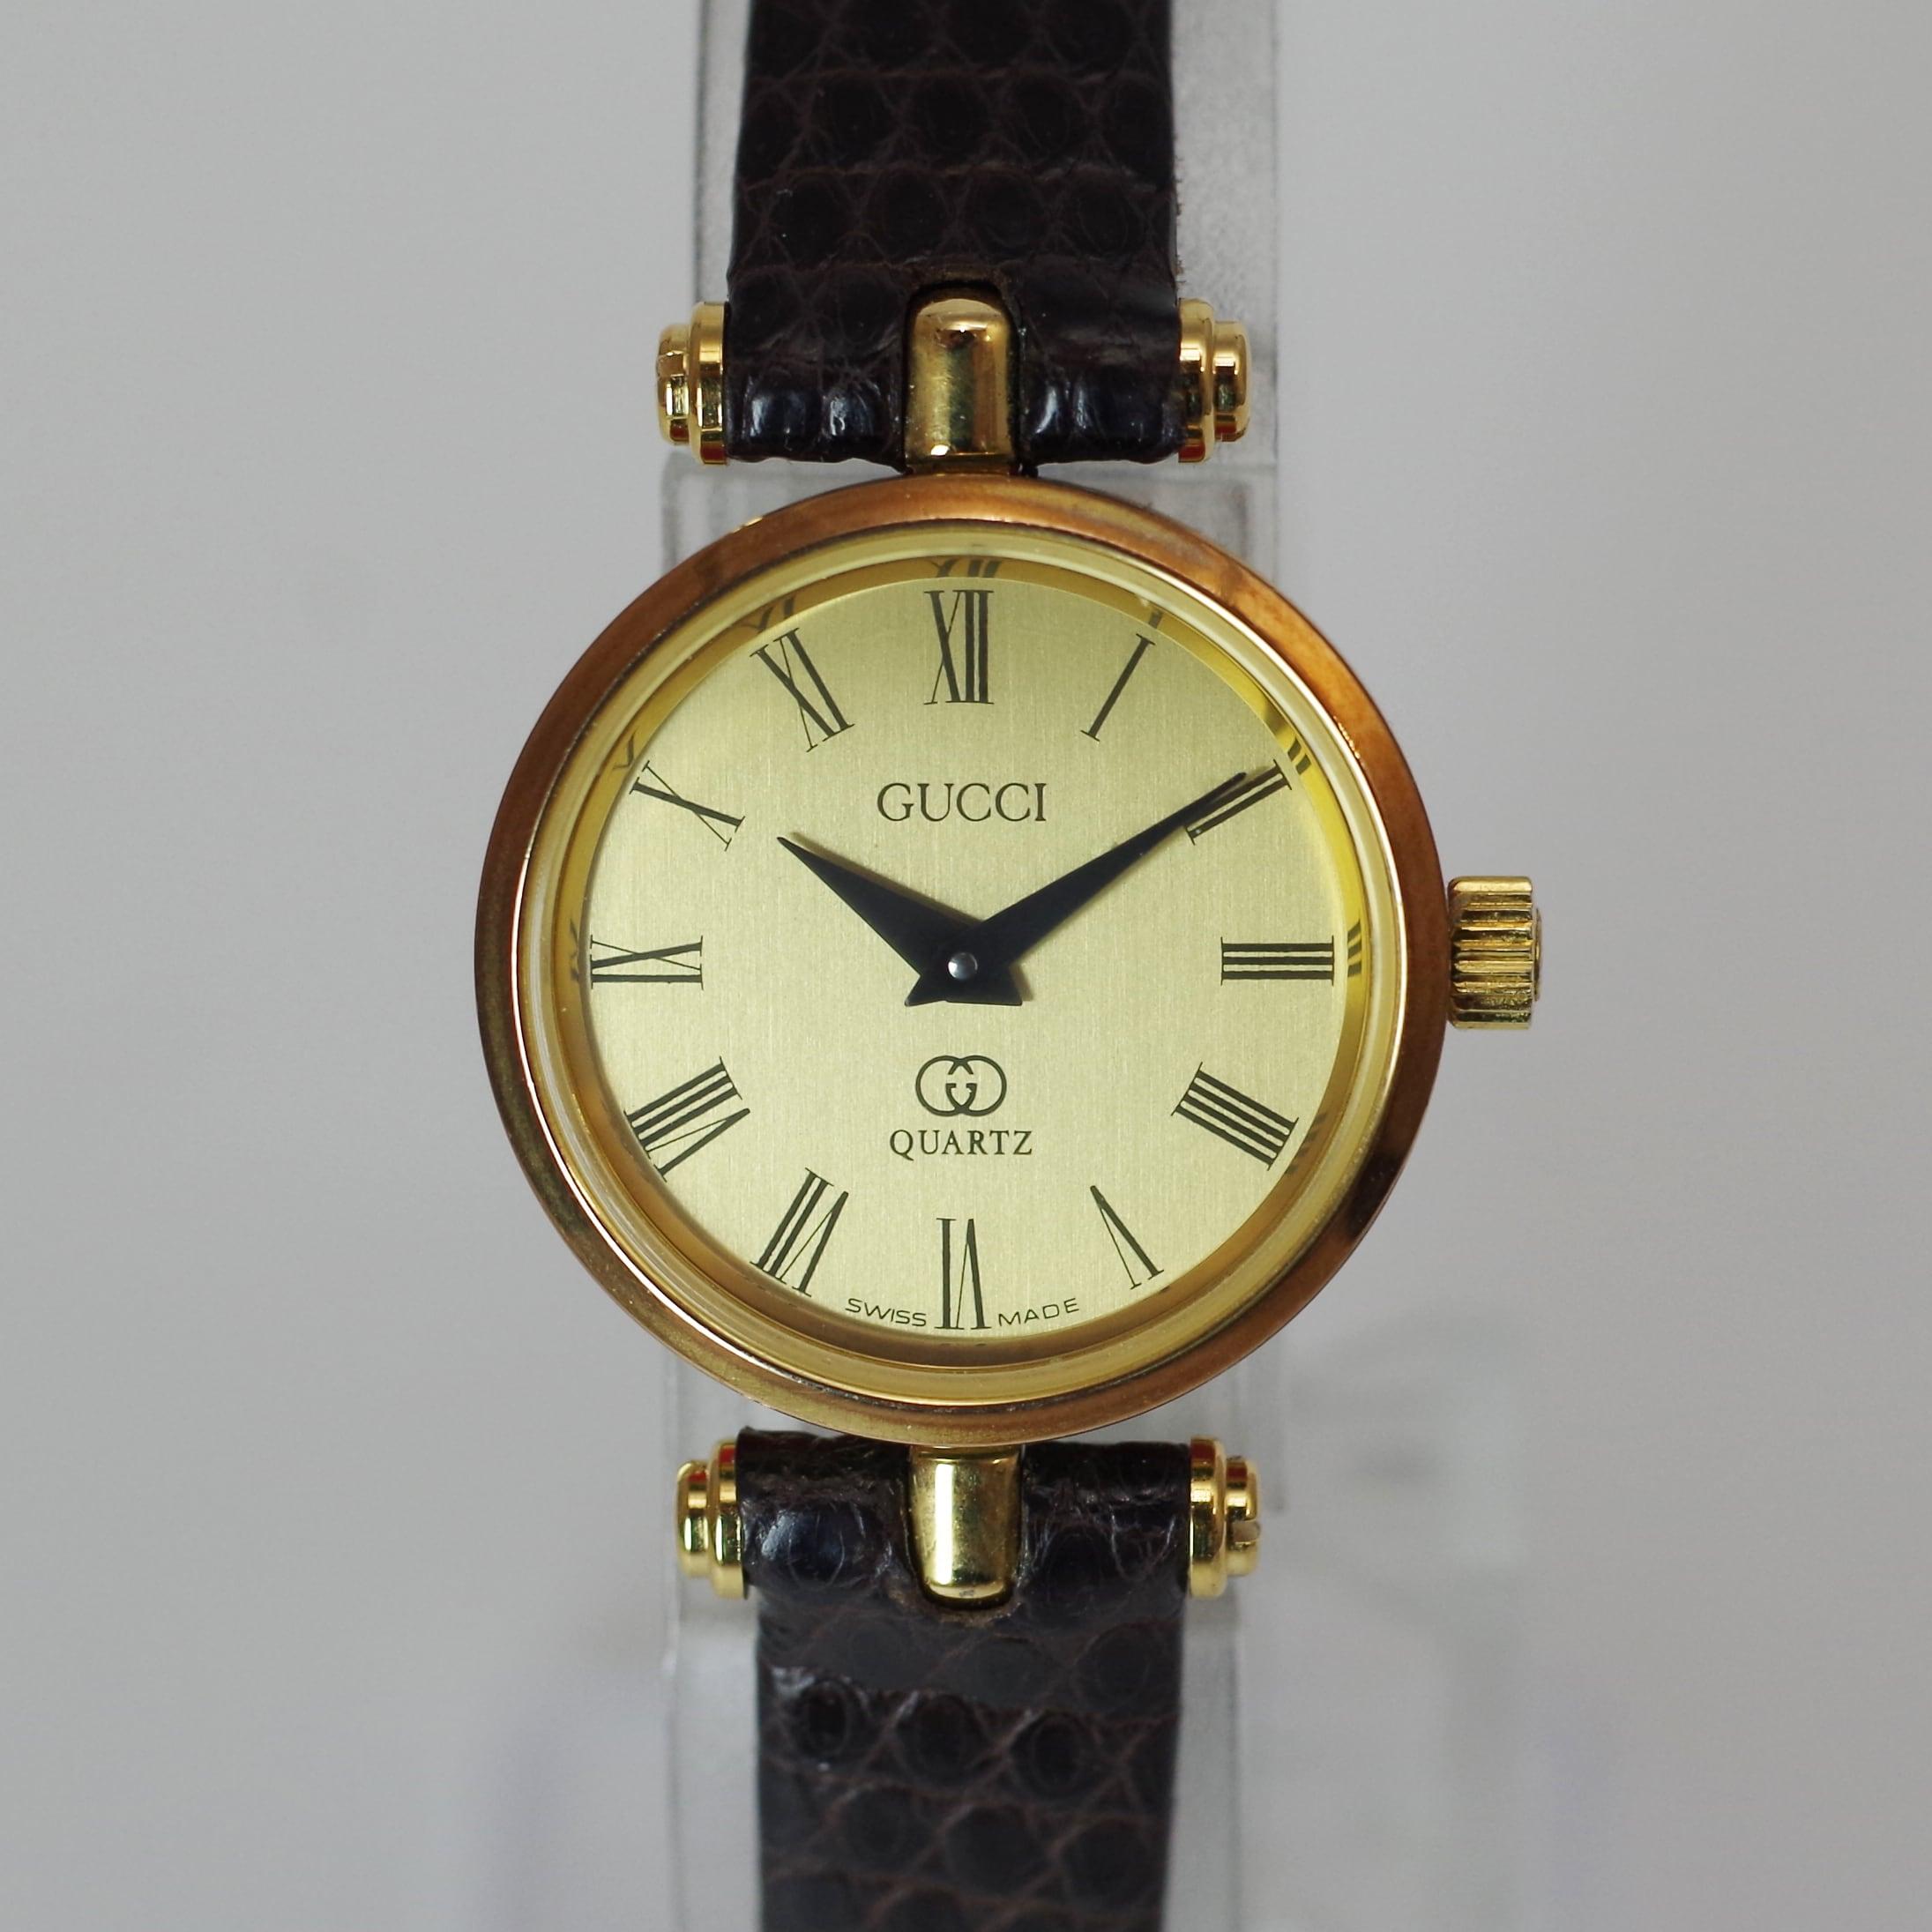 GUCCI グッチ 2040L クオーツ ゴールド 革ベルト 腕時計 レディース